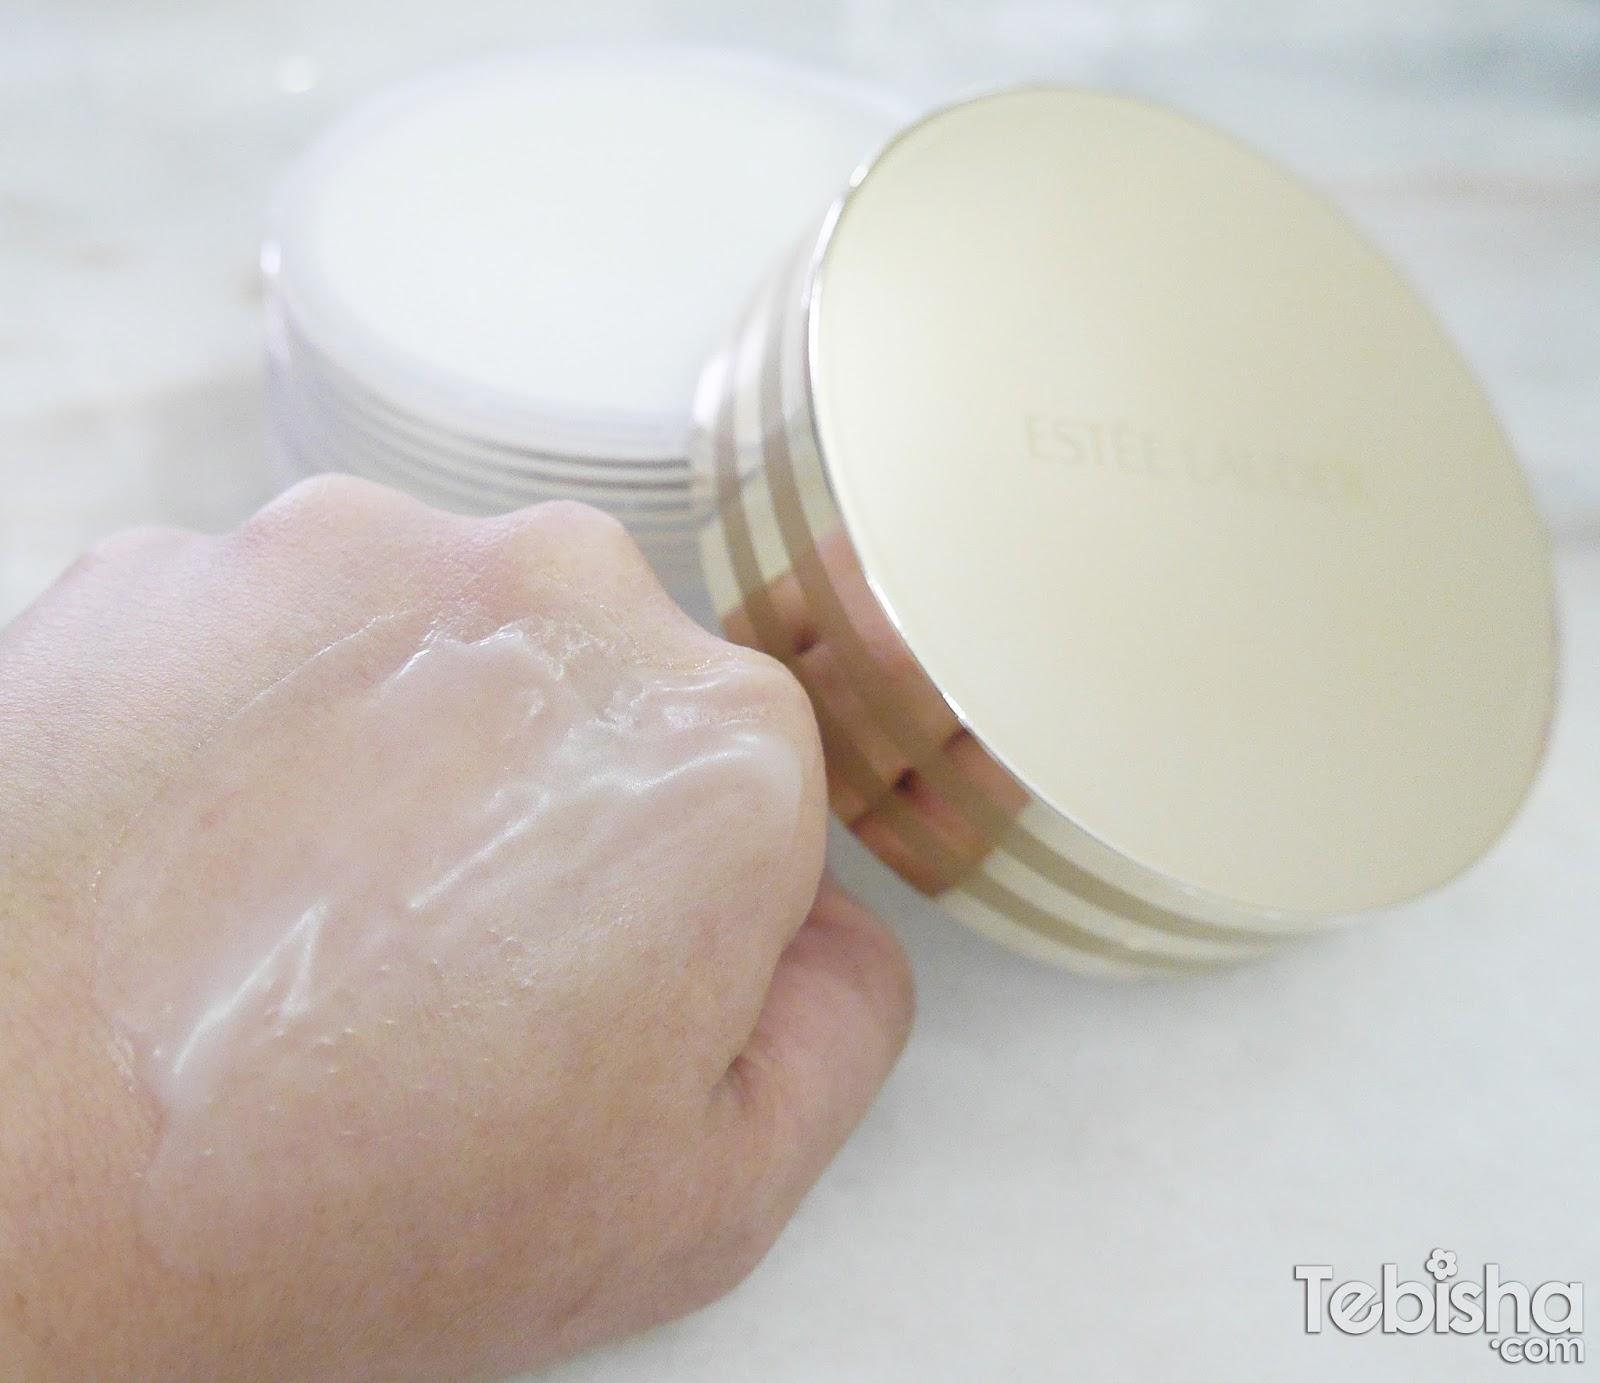 Advanced Night Micro Cleansing Foam by Estée Lauder #16